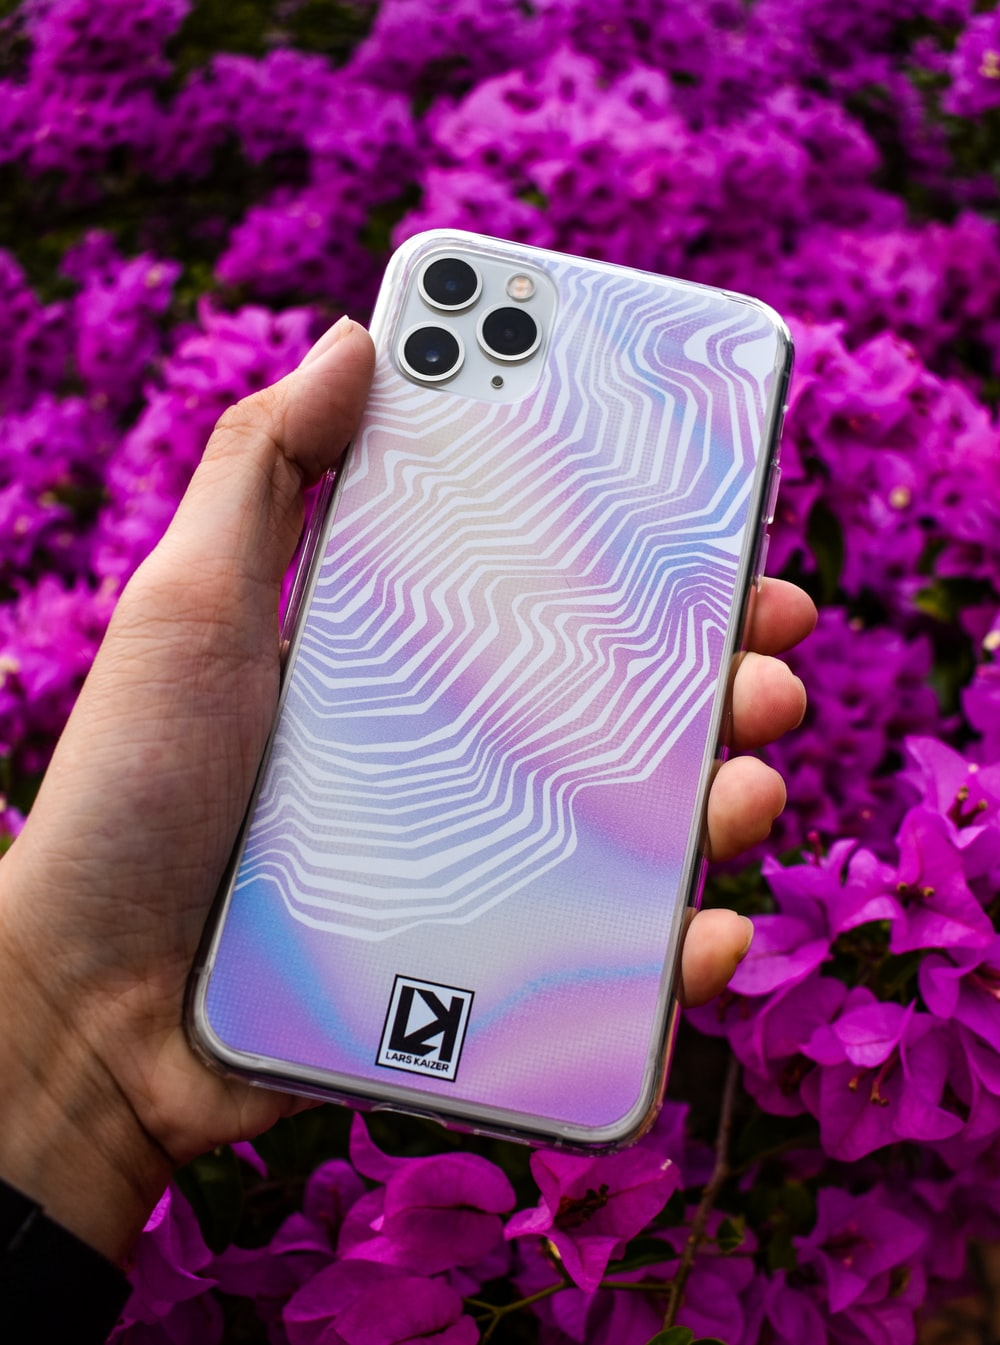 white and black smartphone case